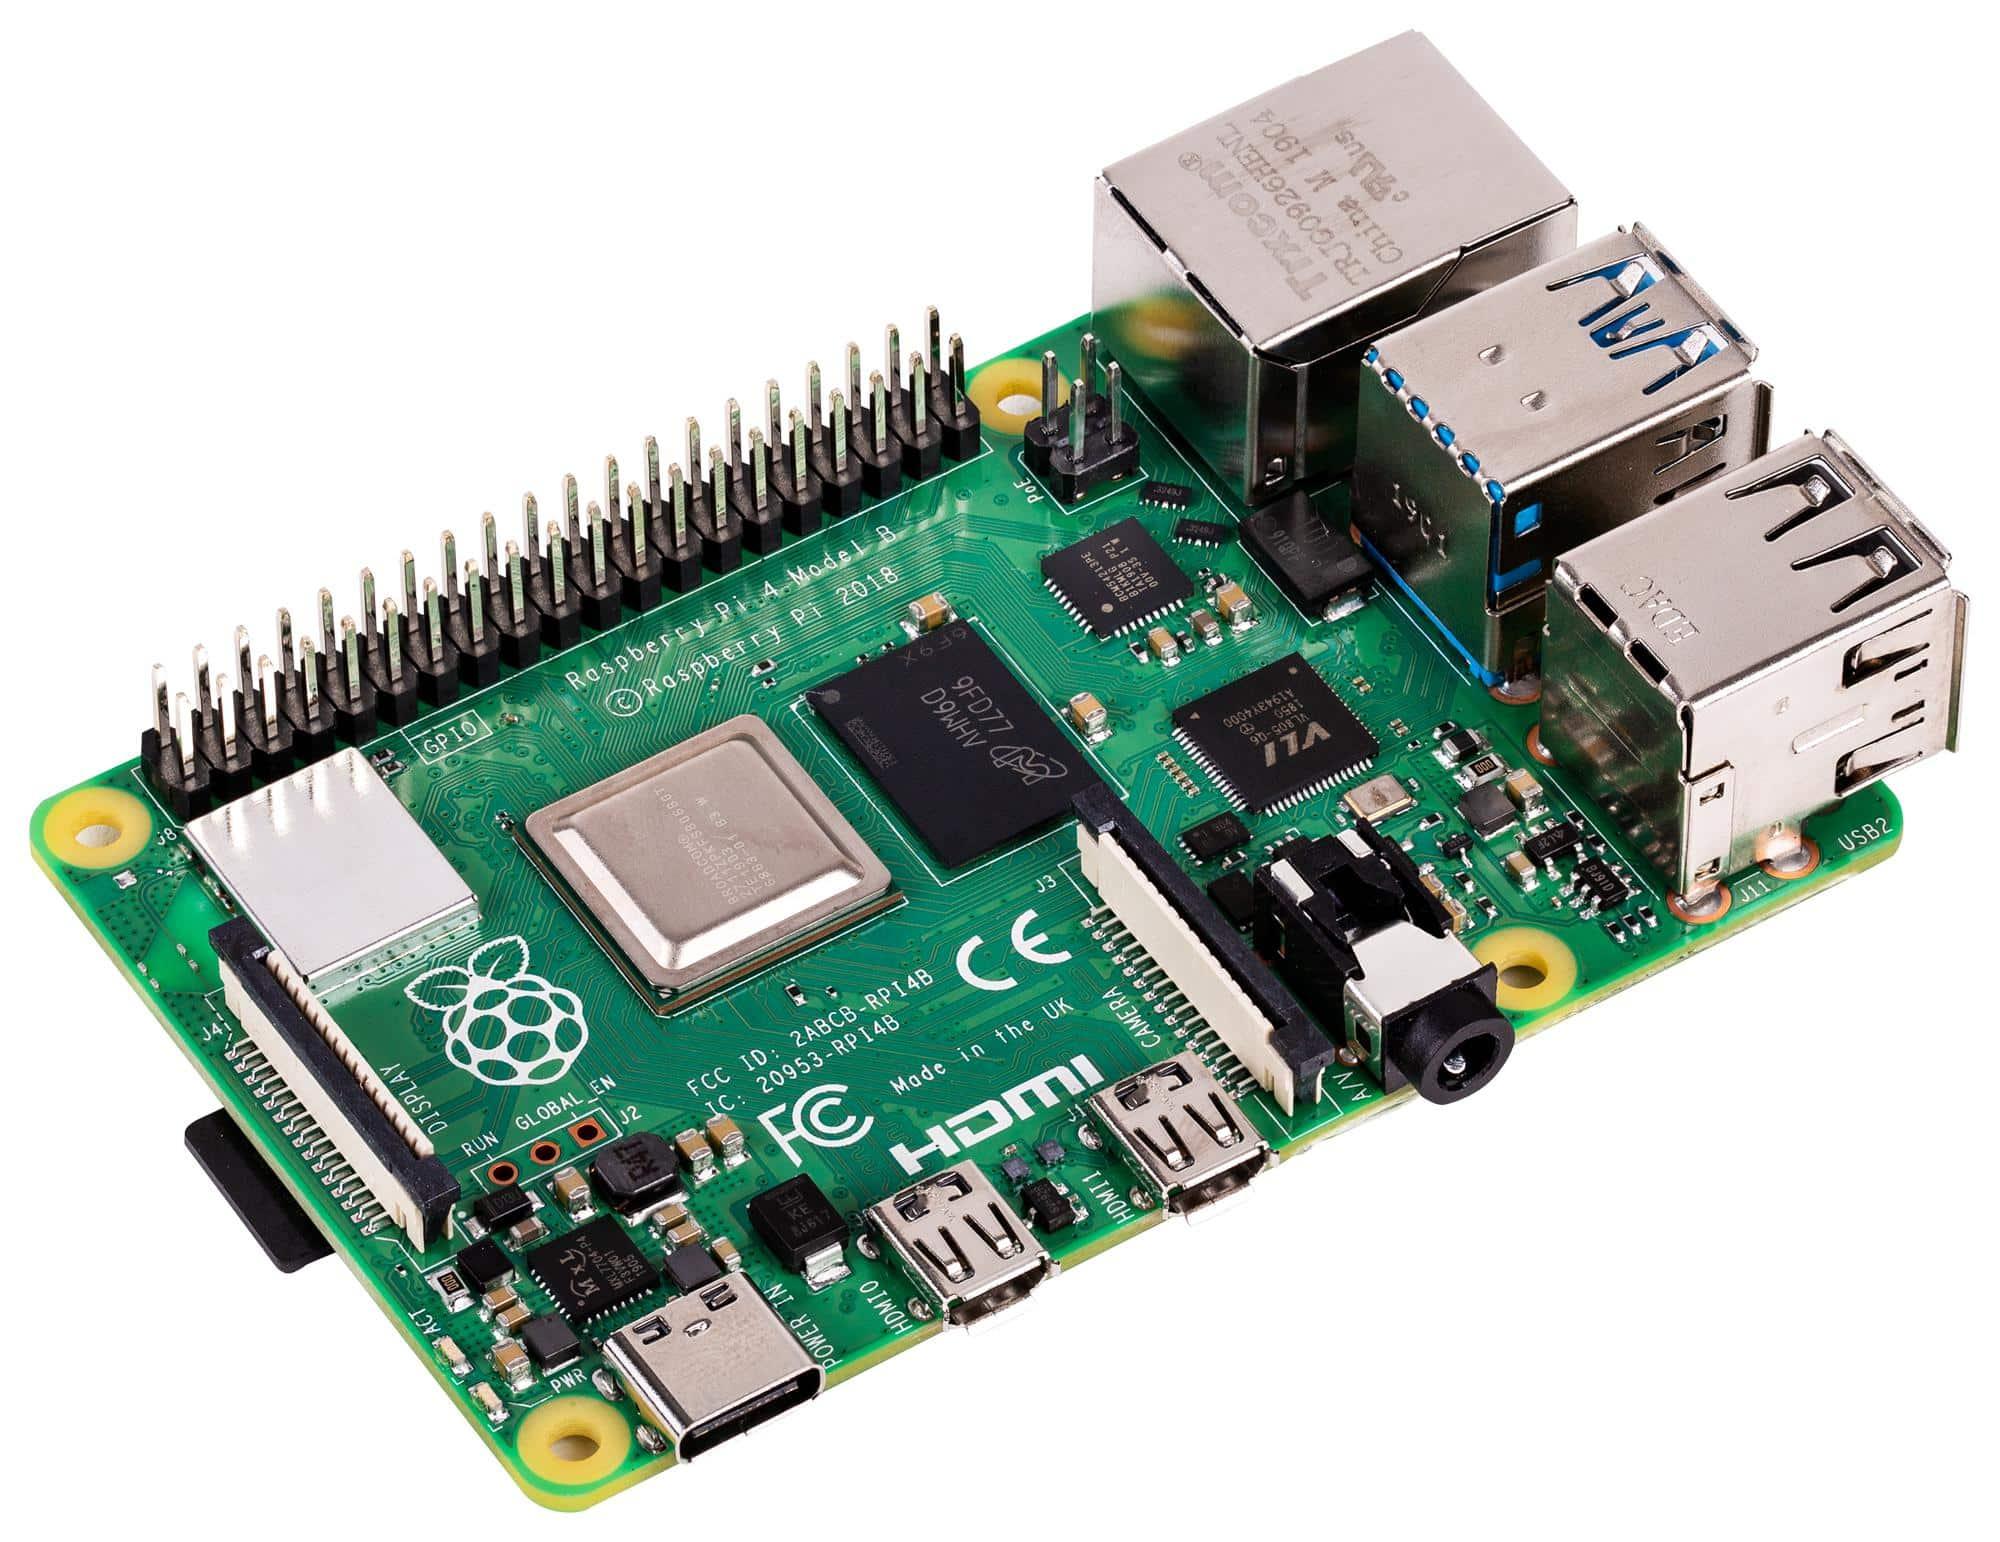 5 euro korting op Raspberry Pi 8GB!